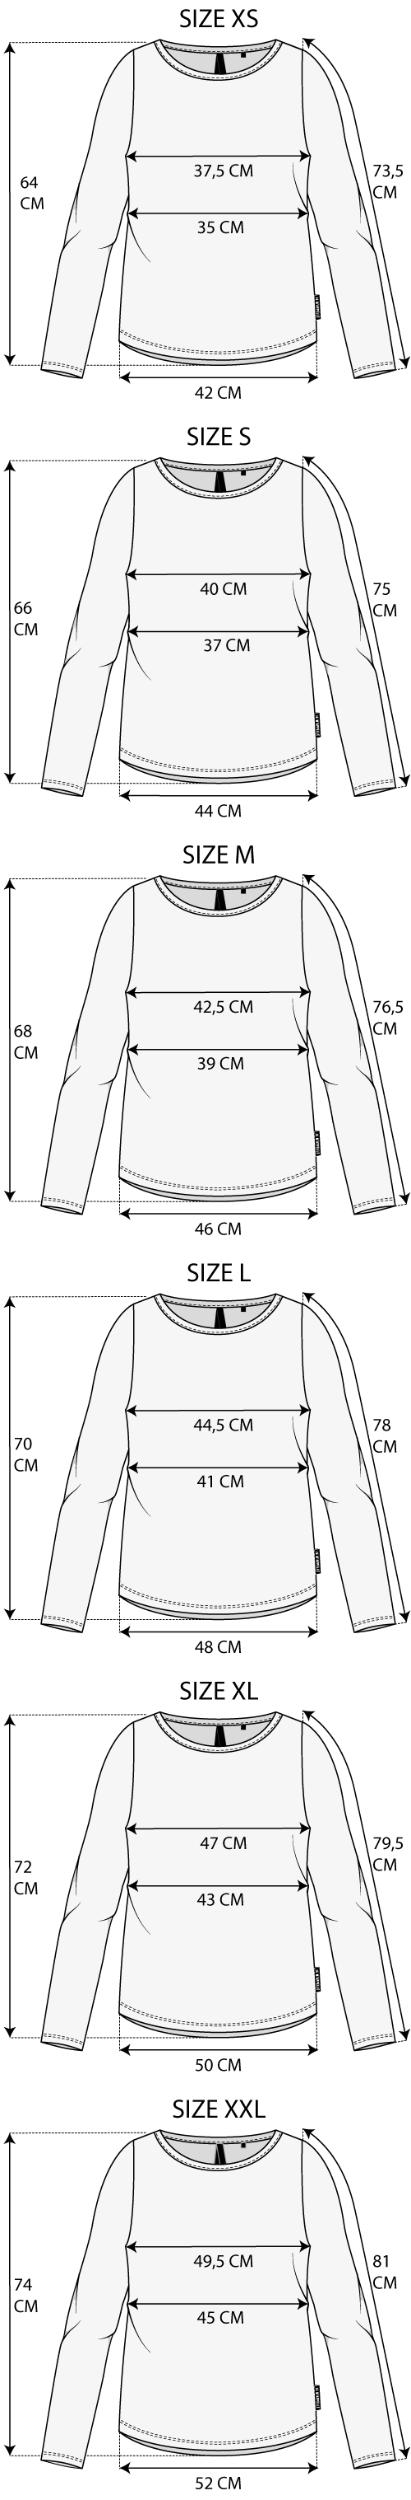 Maattabel Shirt